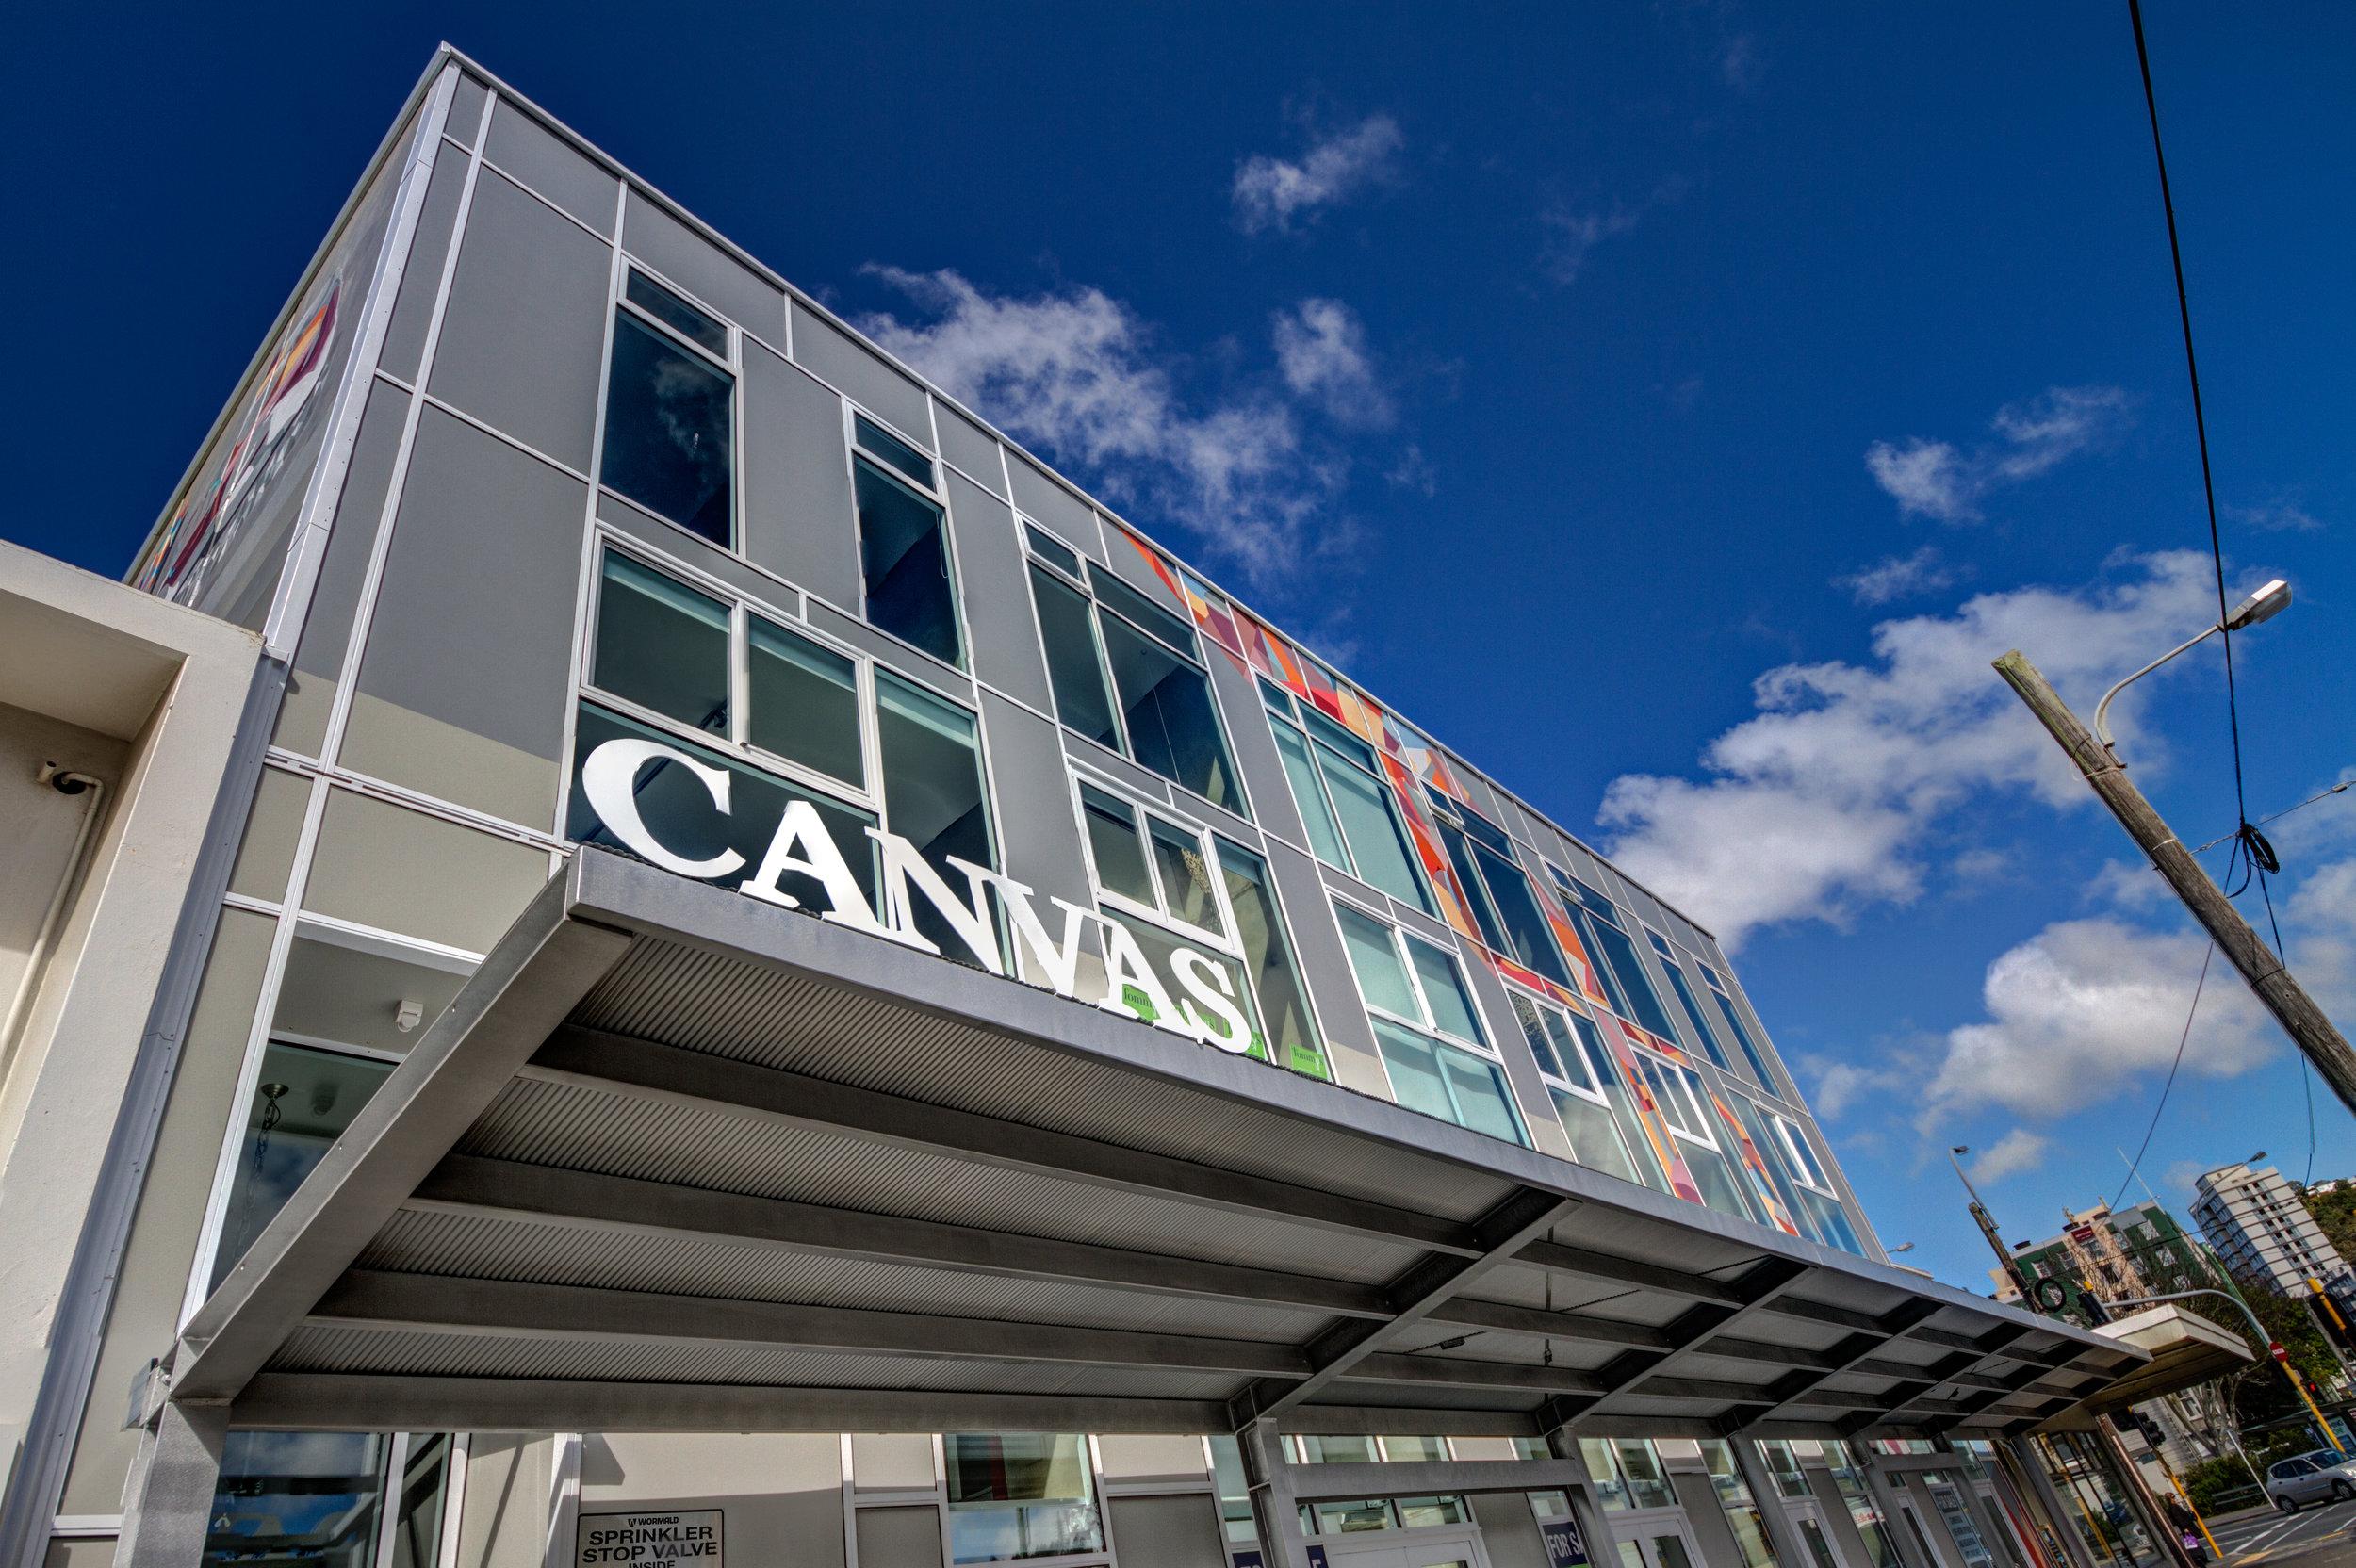 Canvas Apartments by Archaus - Exterior Photograph